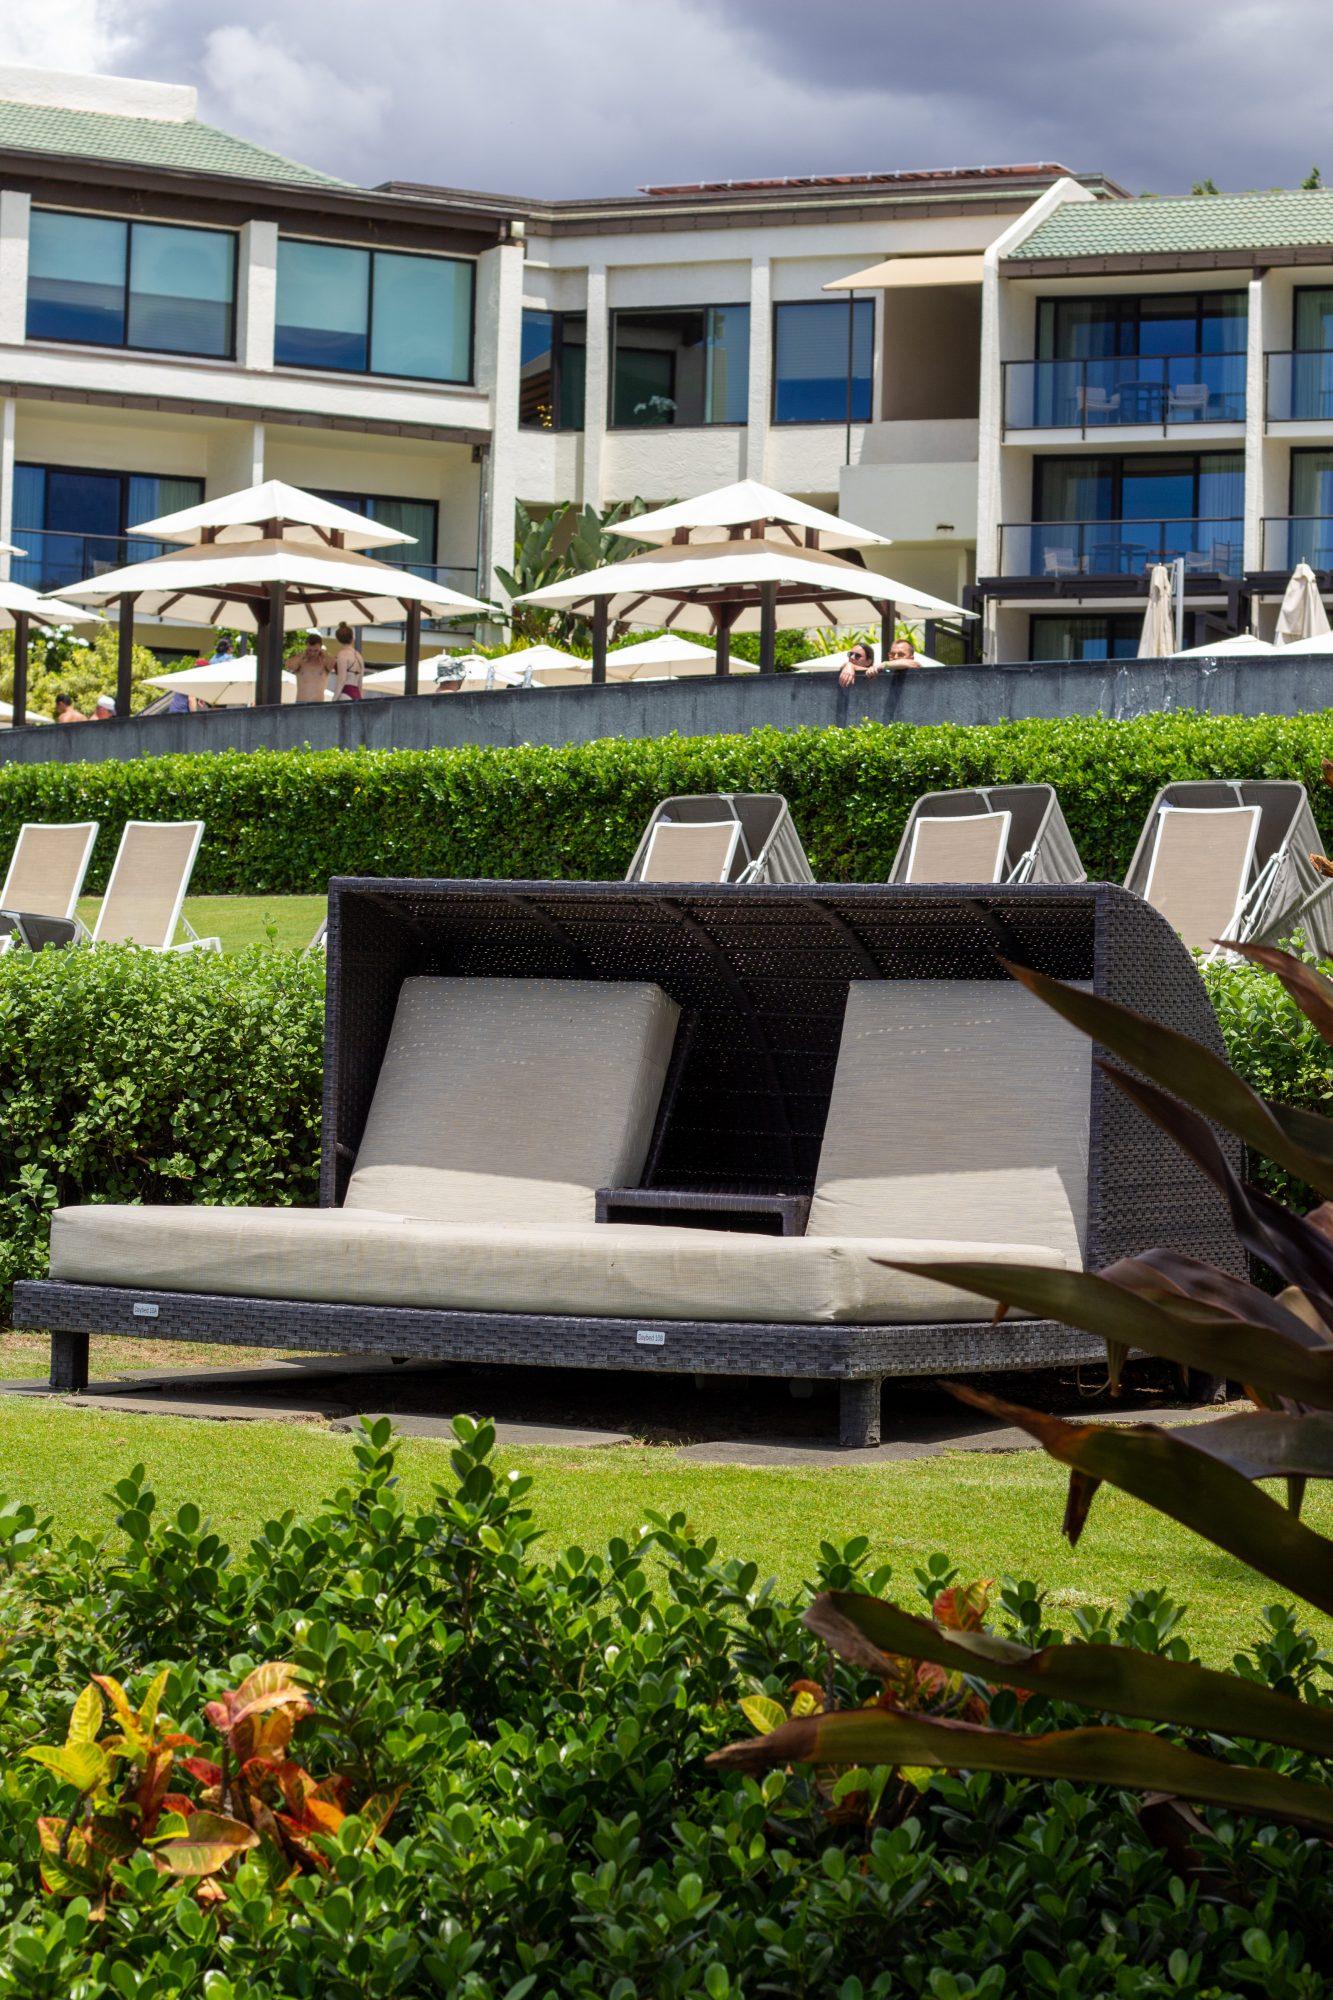 cabanas at Wailea Beach Resort